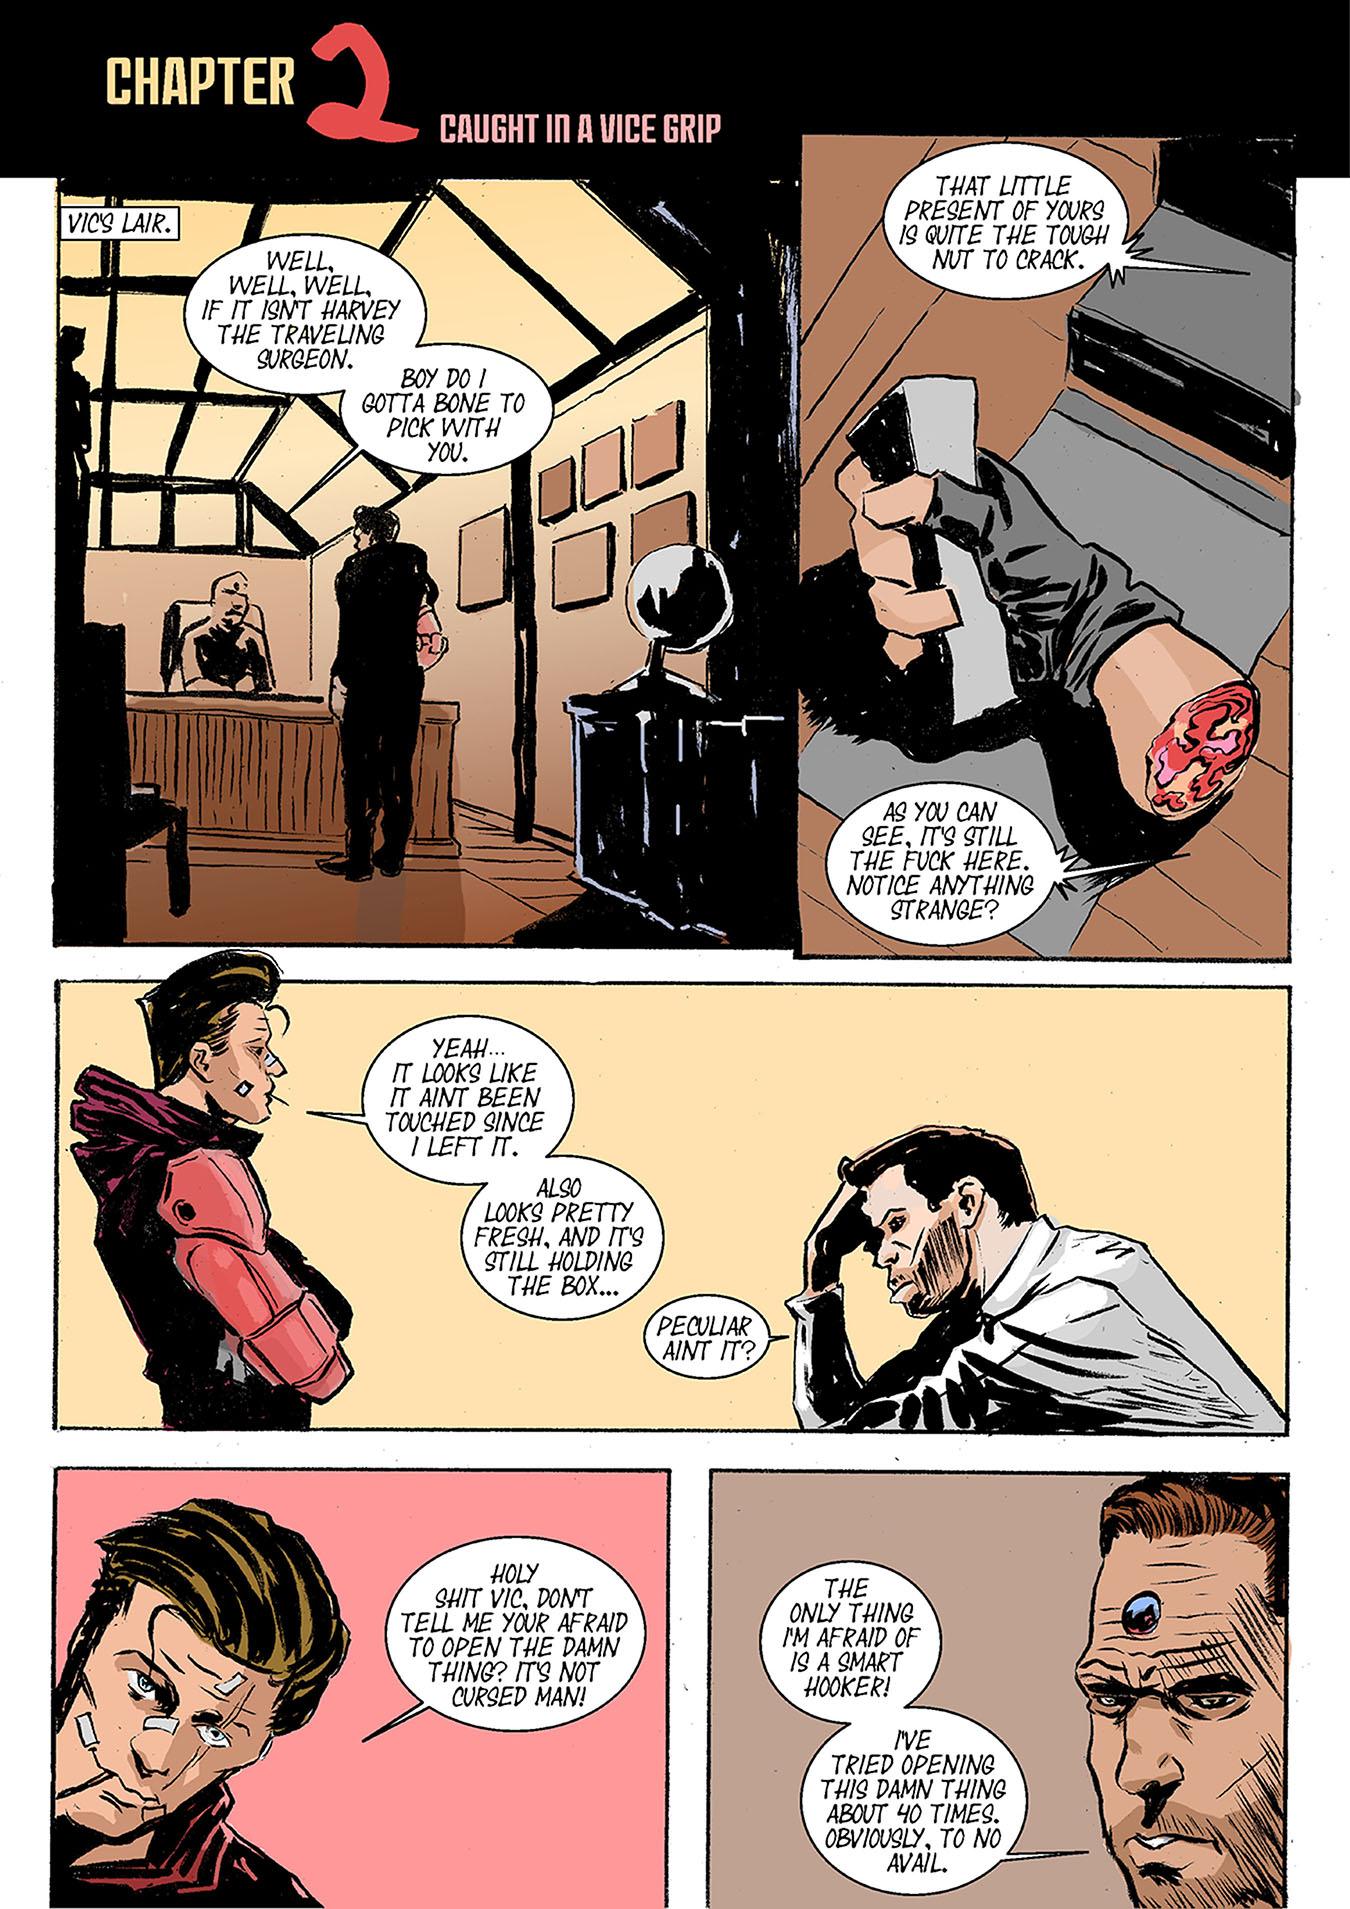 Chp 2 pg 19